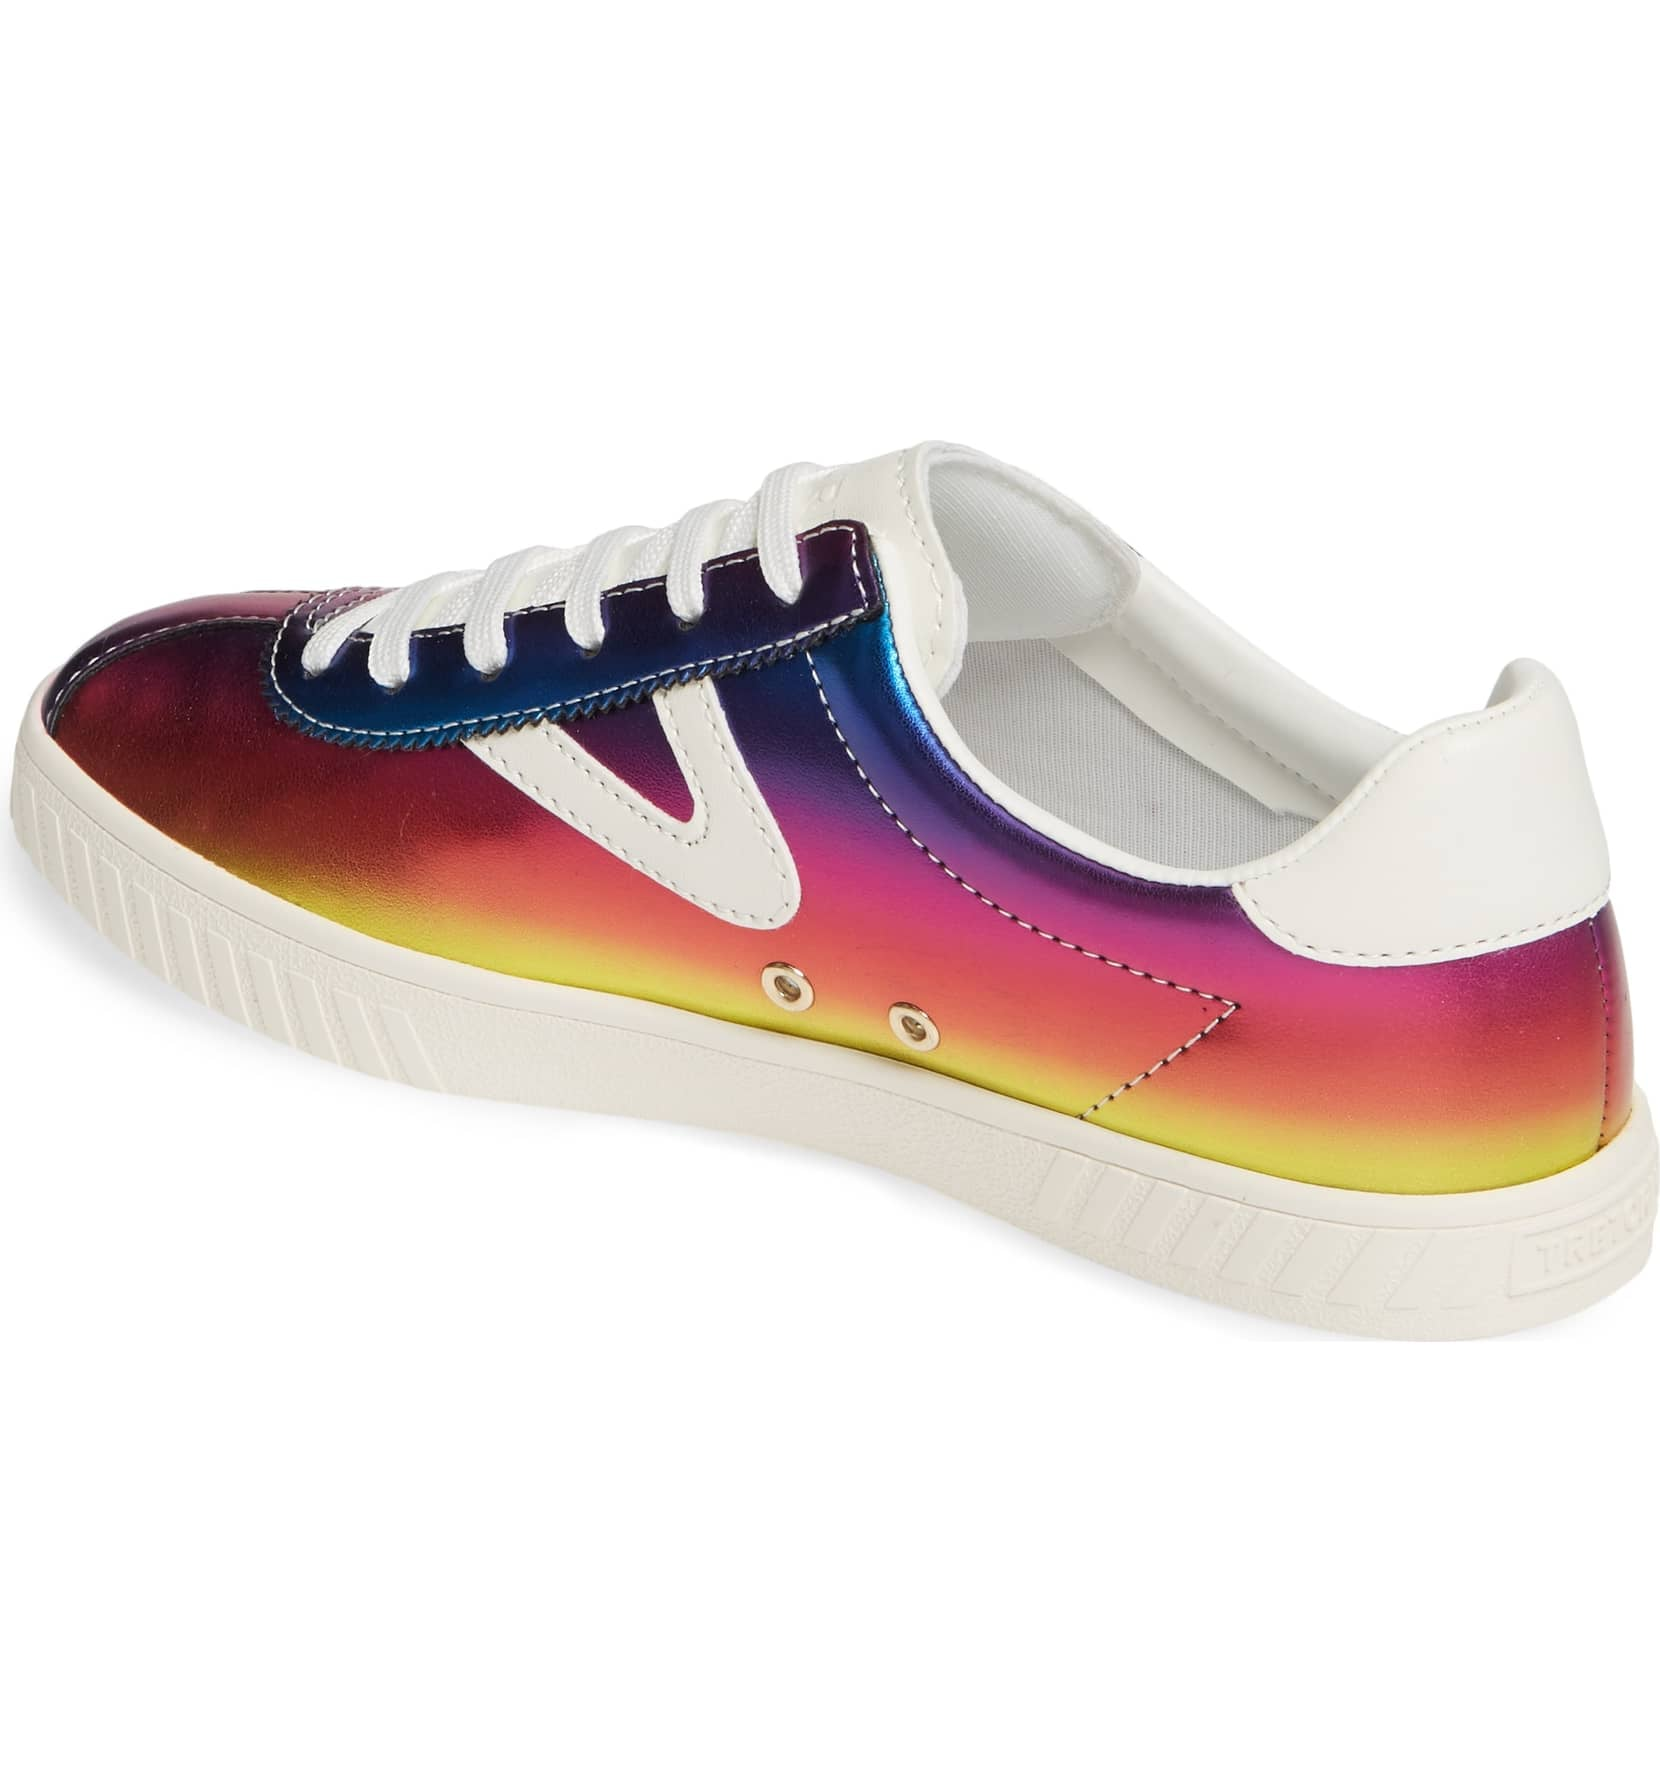 Tretorn Rainbow Sneakers 2019